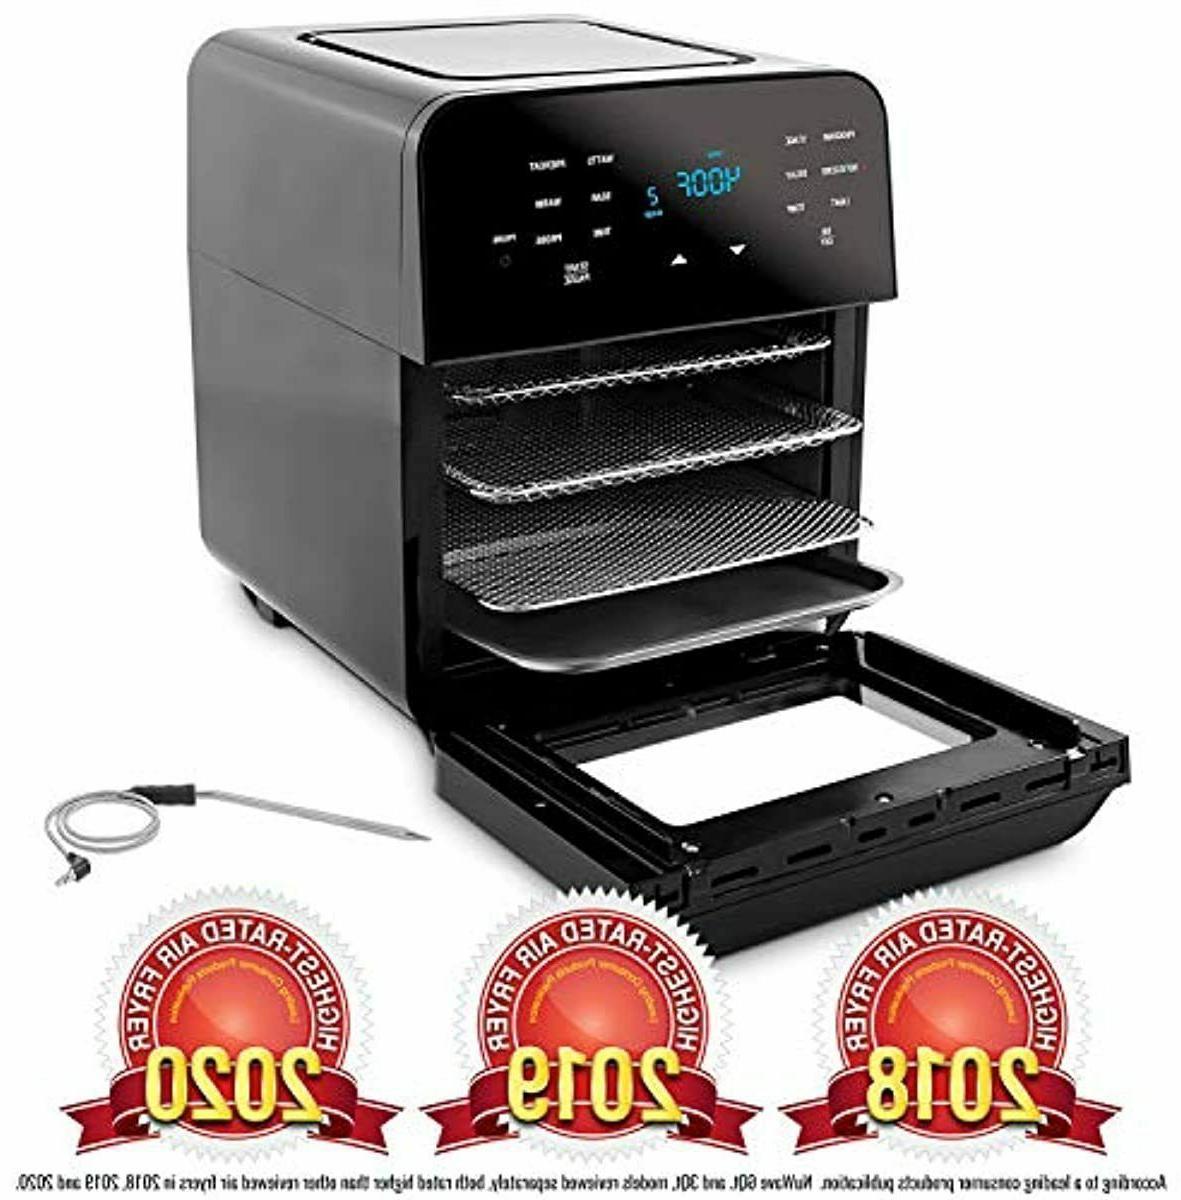 NUWAVE BRIO 14-Quart Large Capacity Air Fryer Oven with Digi